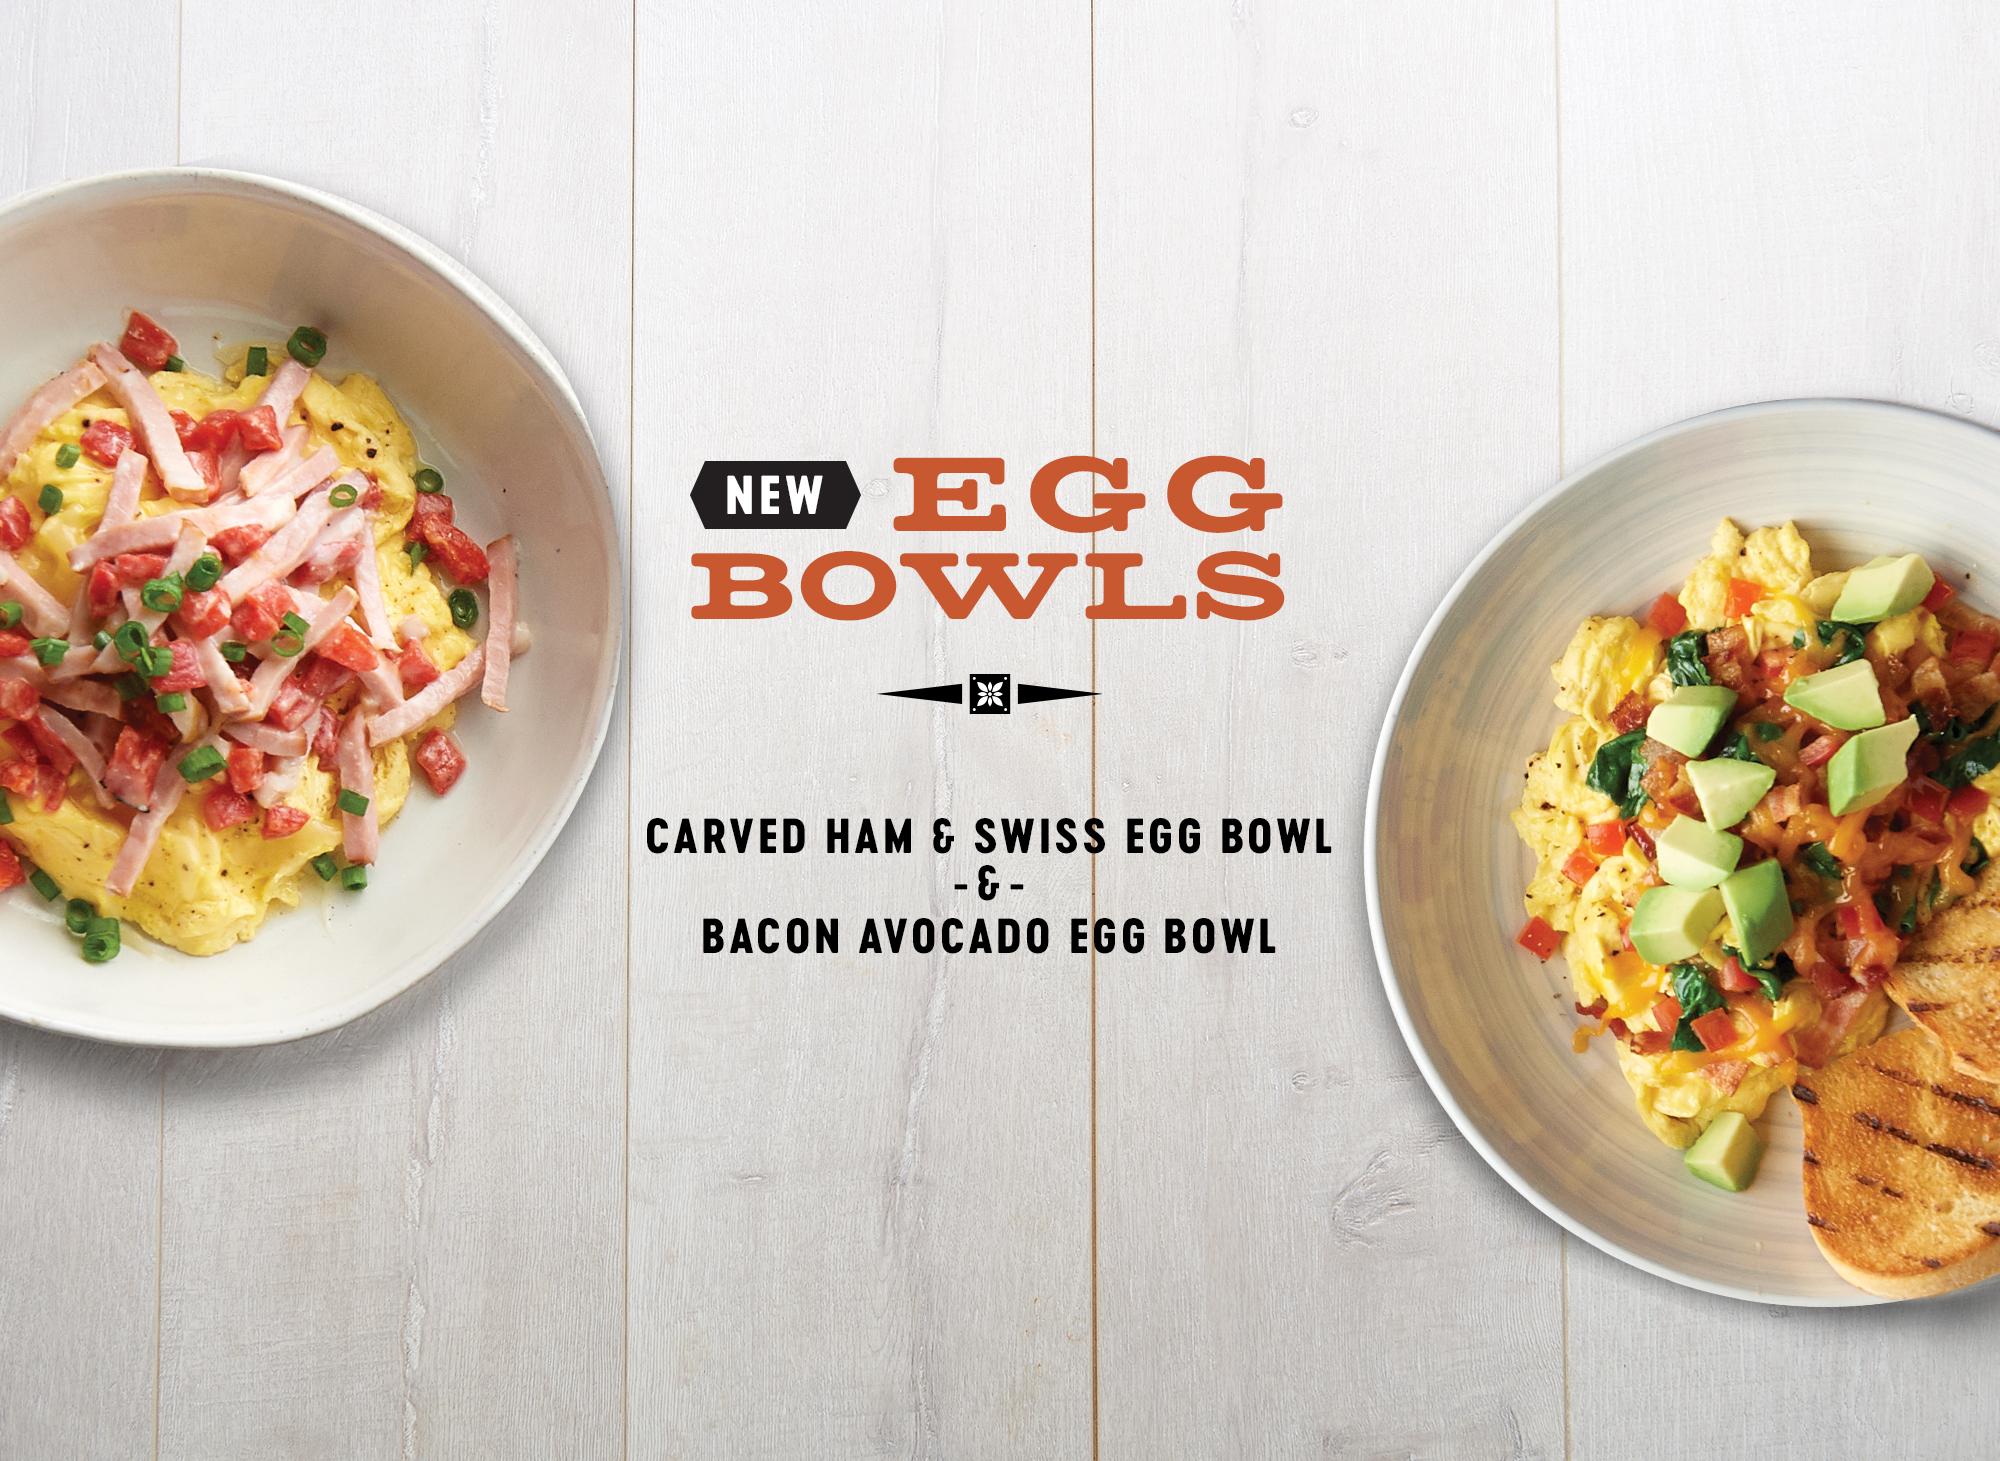 New Egg Bowls